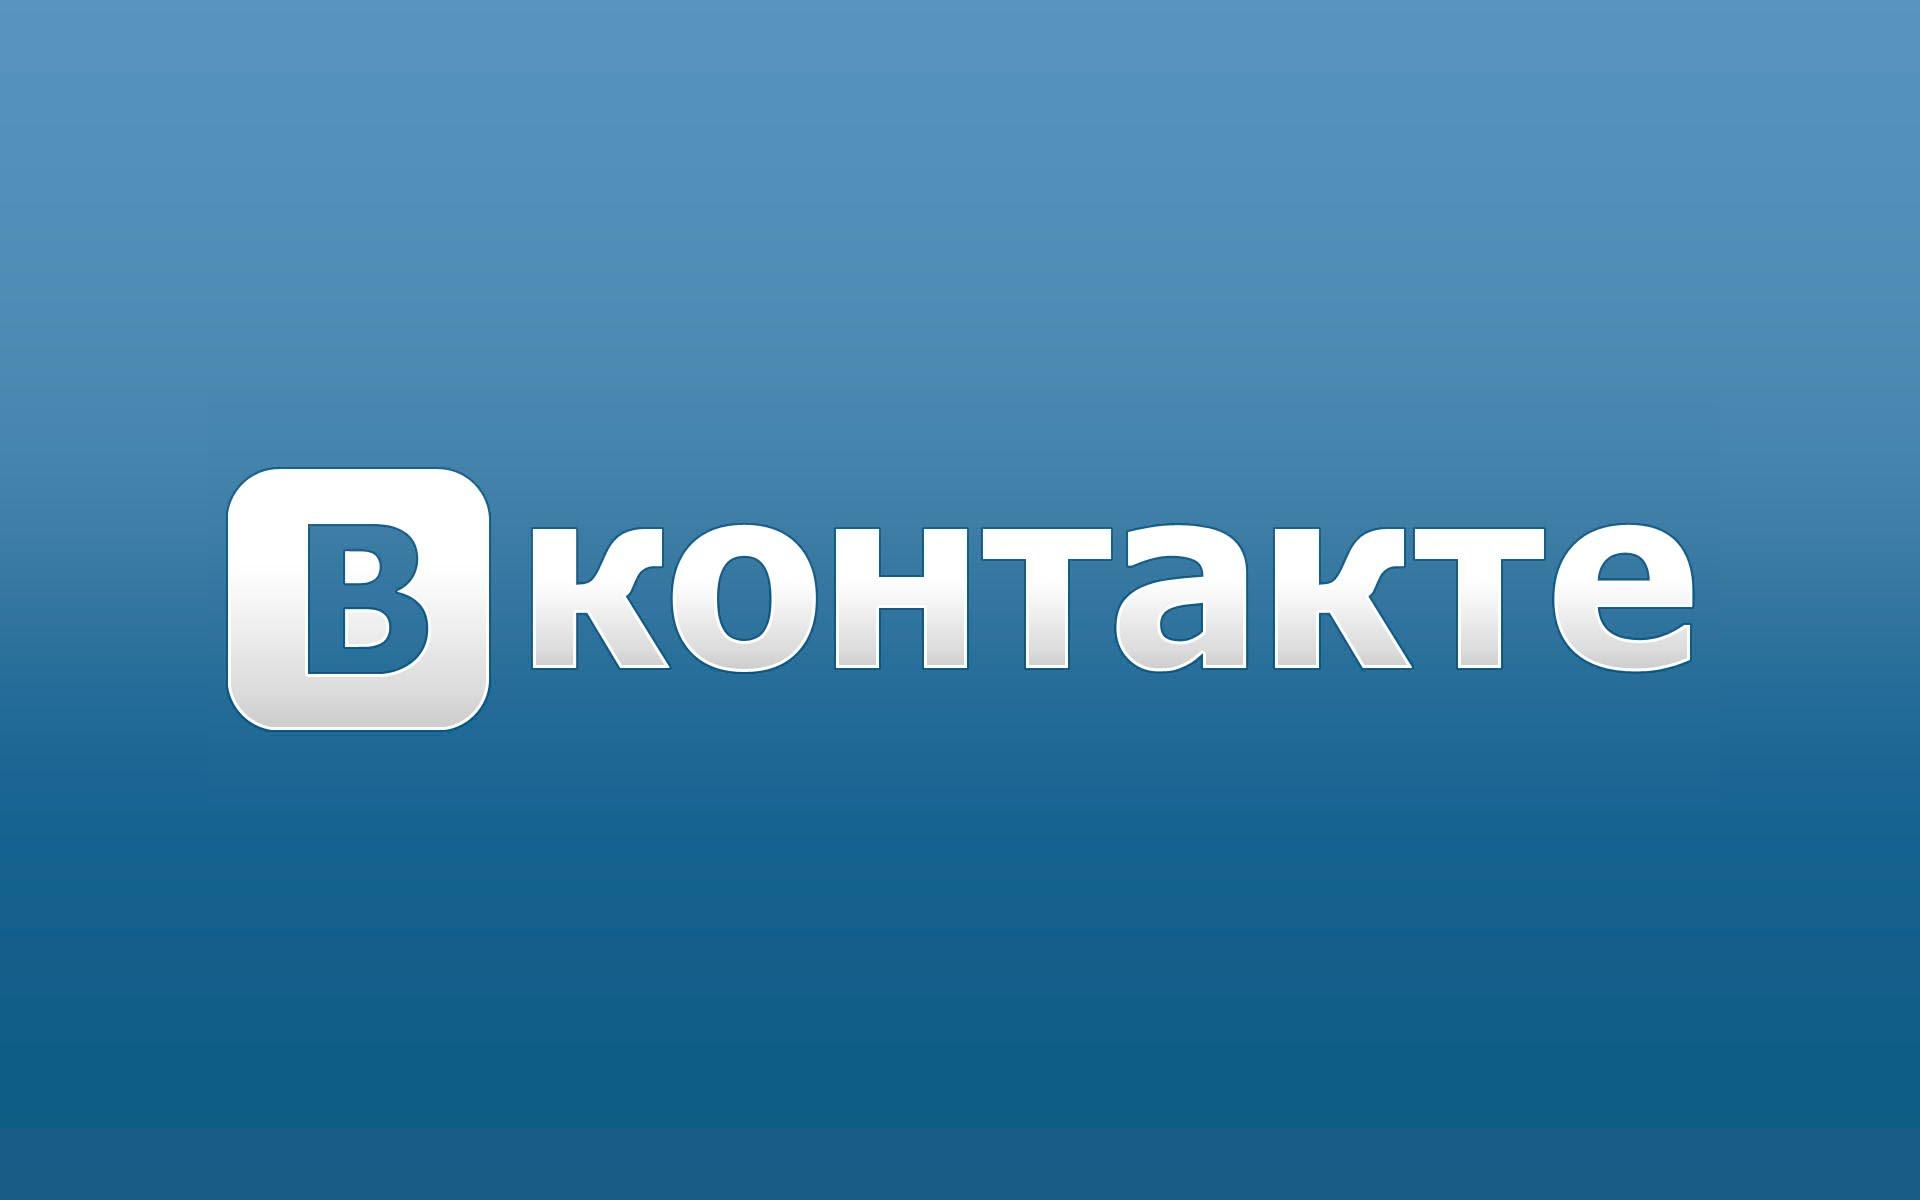 ВКонтакте сотрудничает со следствием